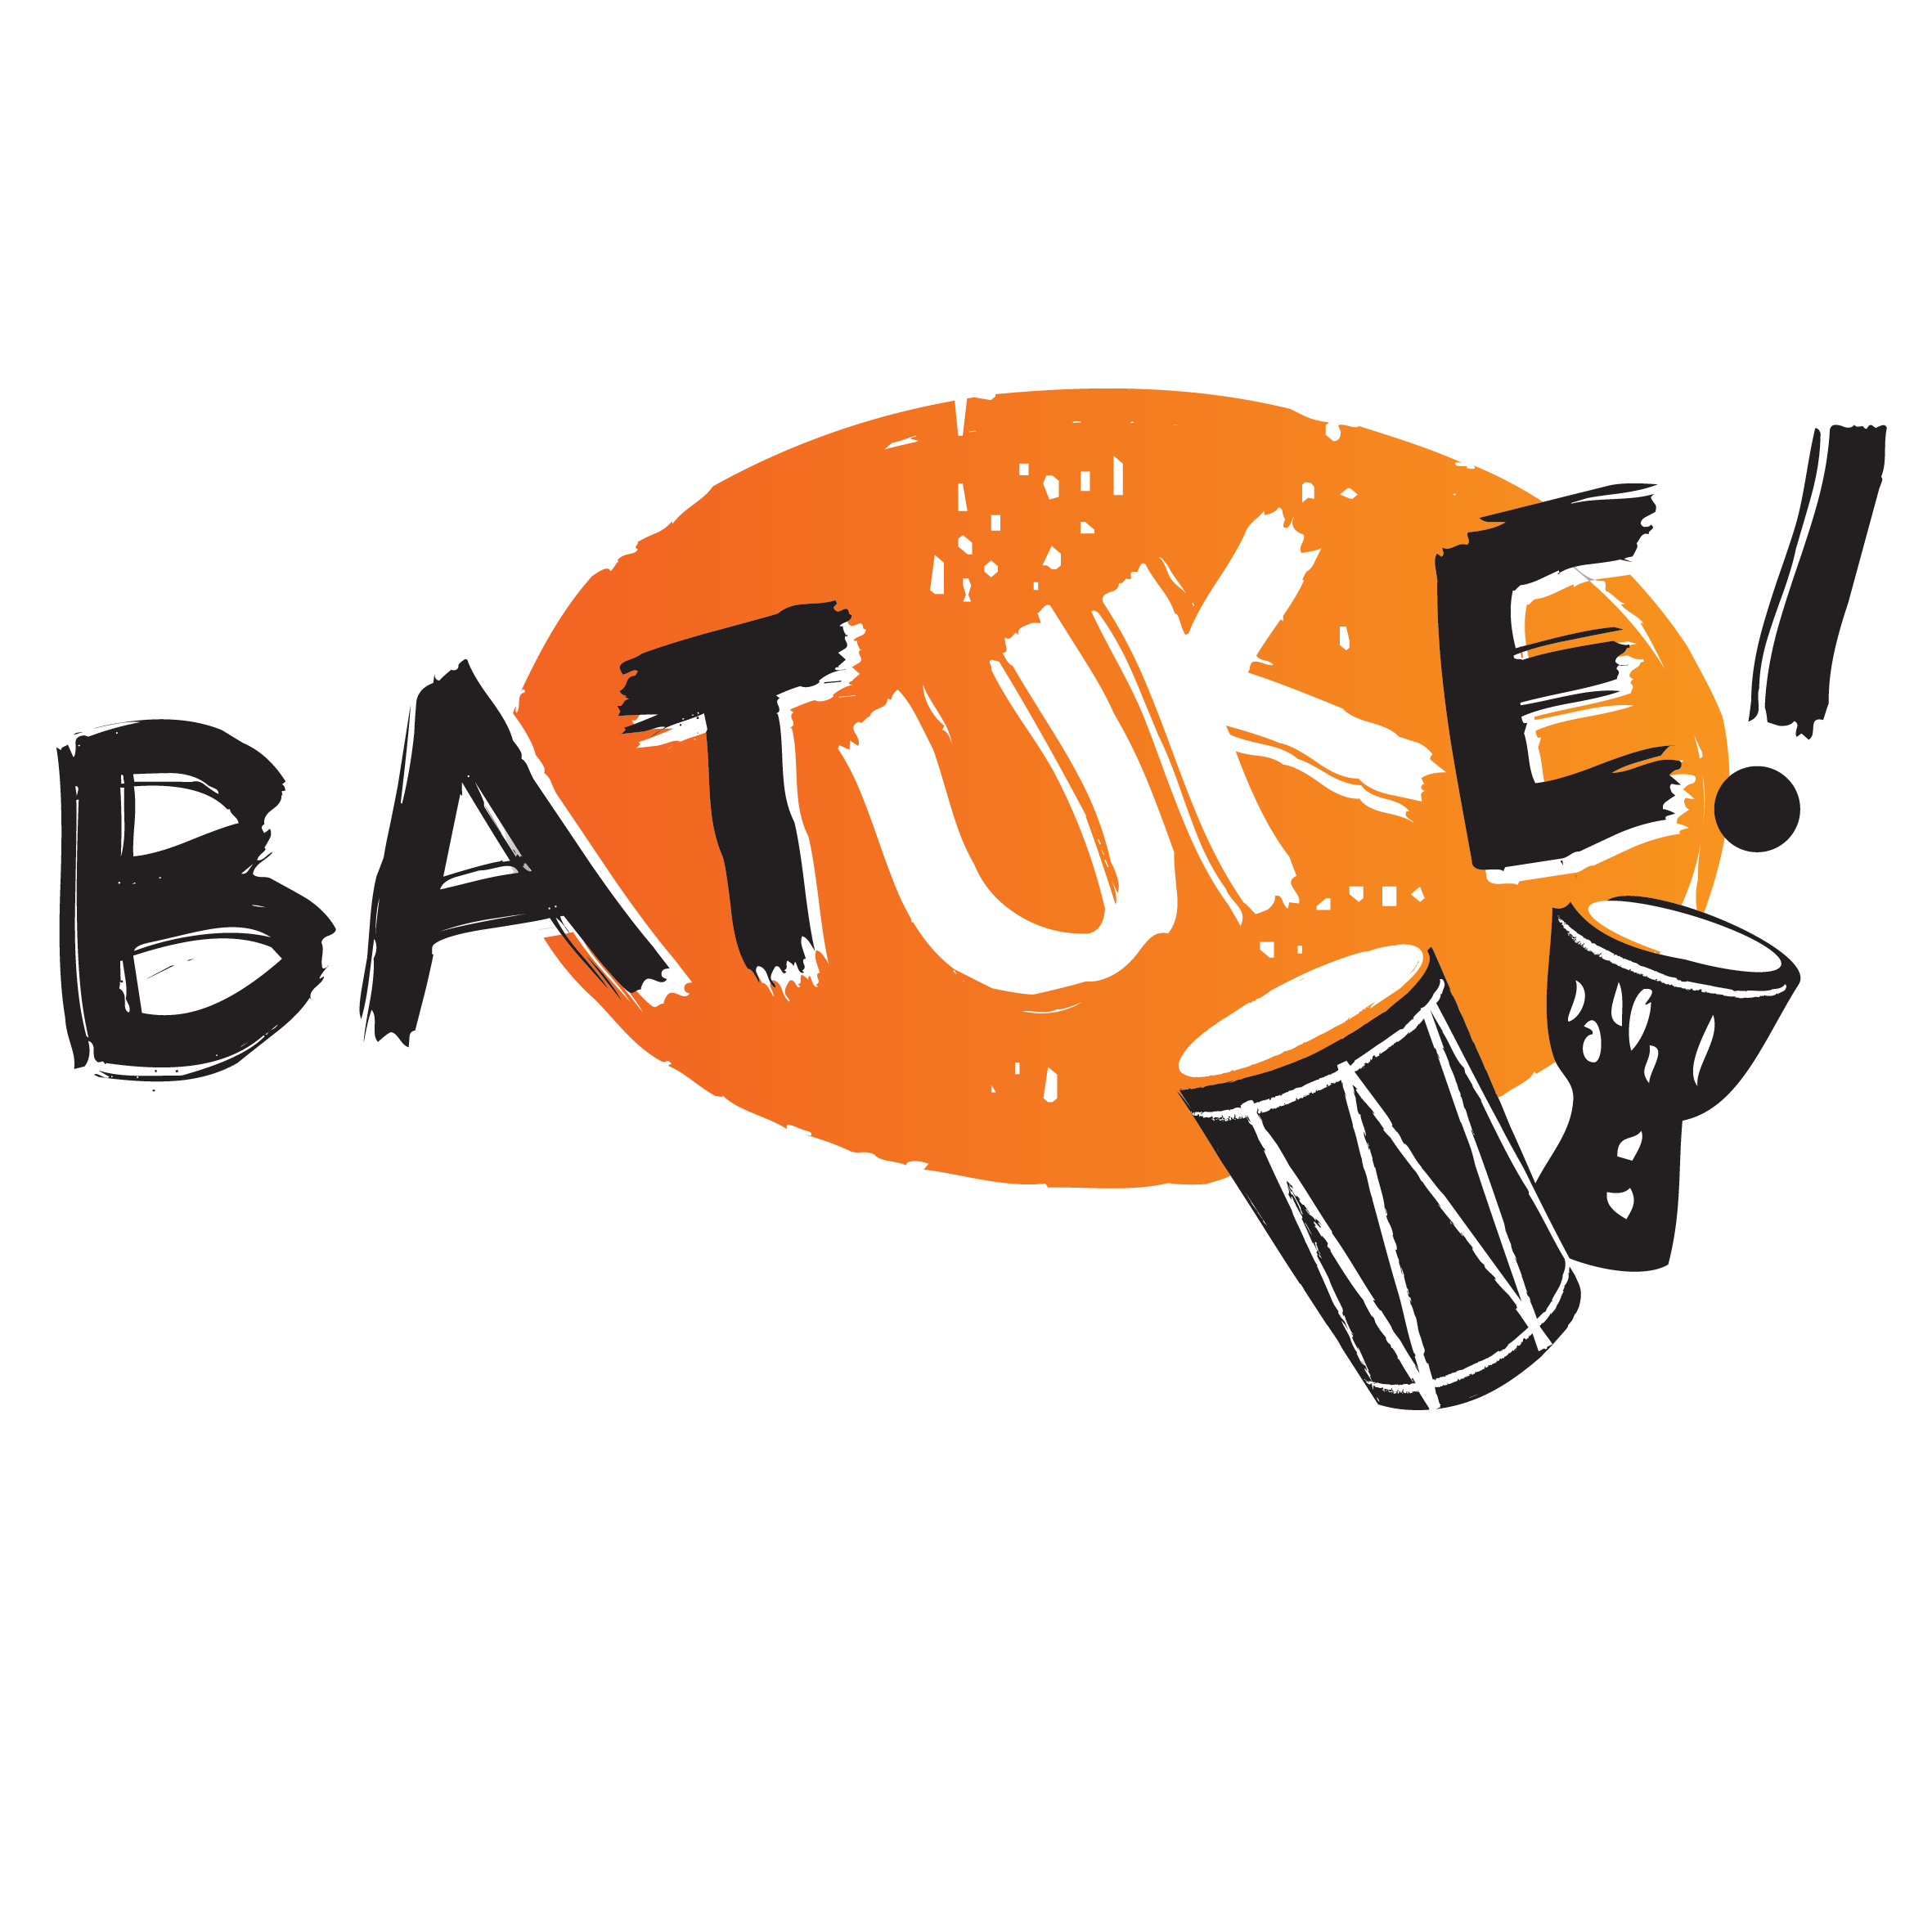 Batuke-transparent-background